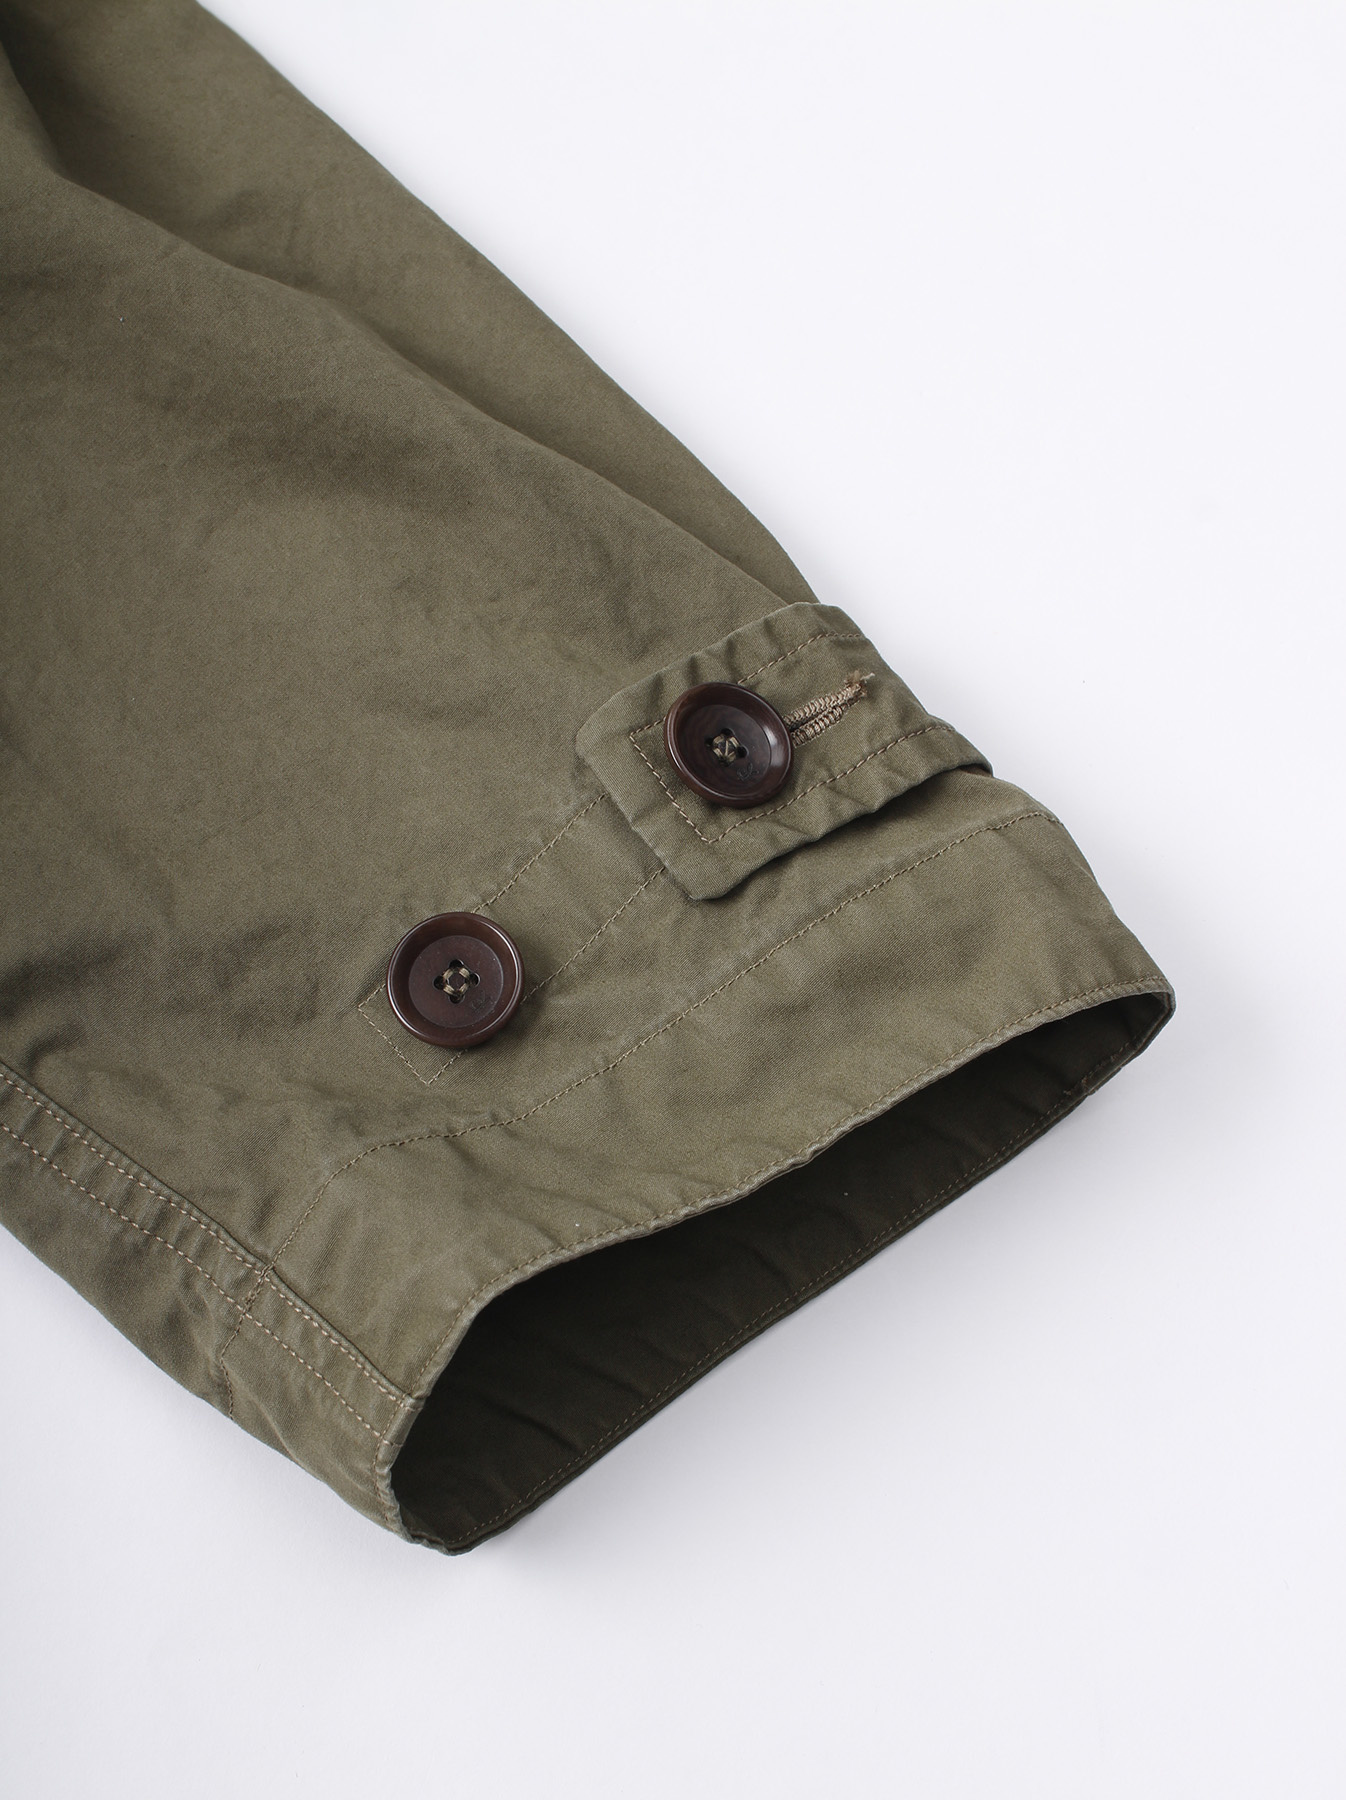 Weather Cloth Umahiko Mods Hoodie-11